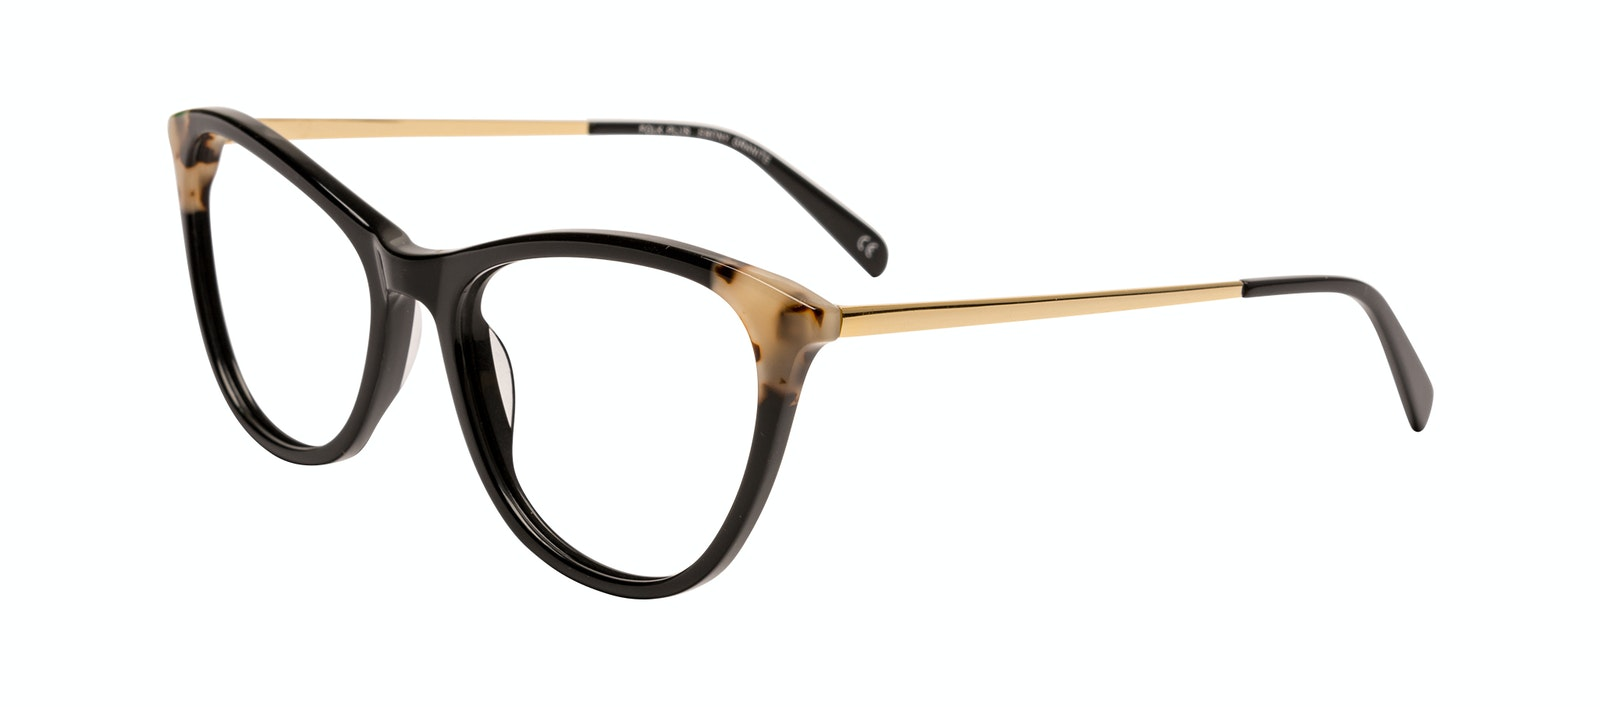 Affordable Fashion Glasses Rectangle Eyeglasses Women Folk Plus Ebony Granite Tilt